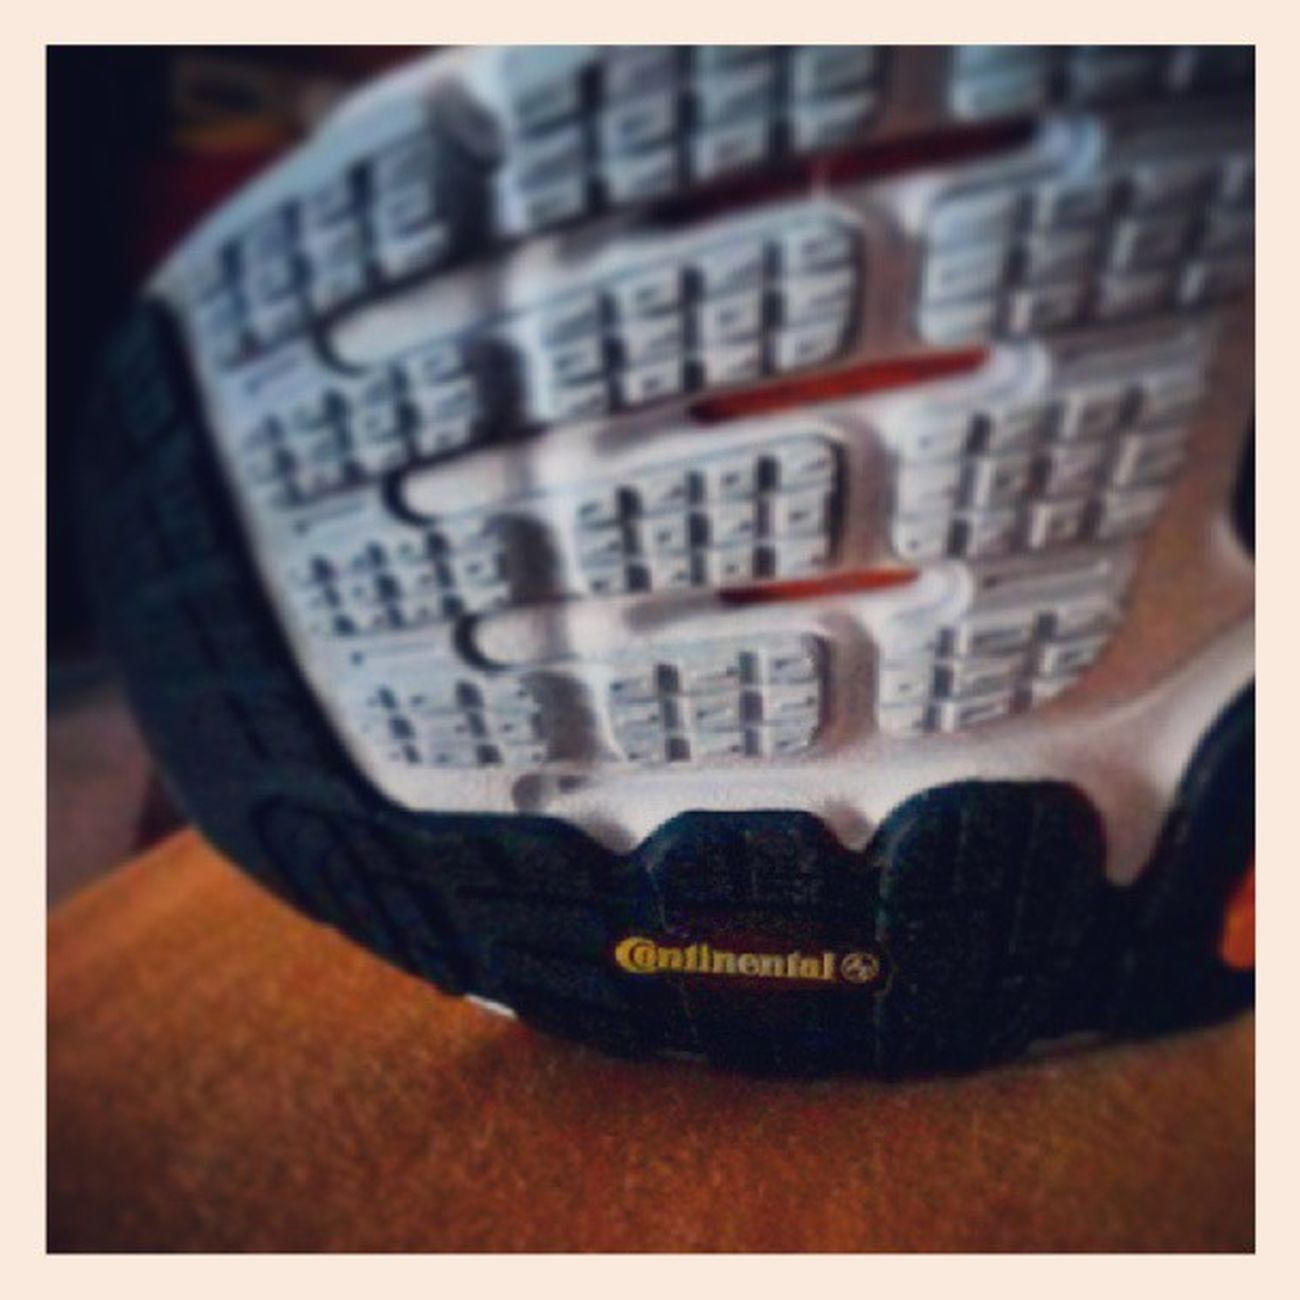 Conti Slicks Running Adidas